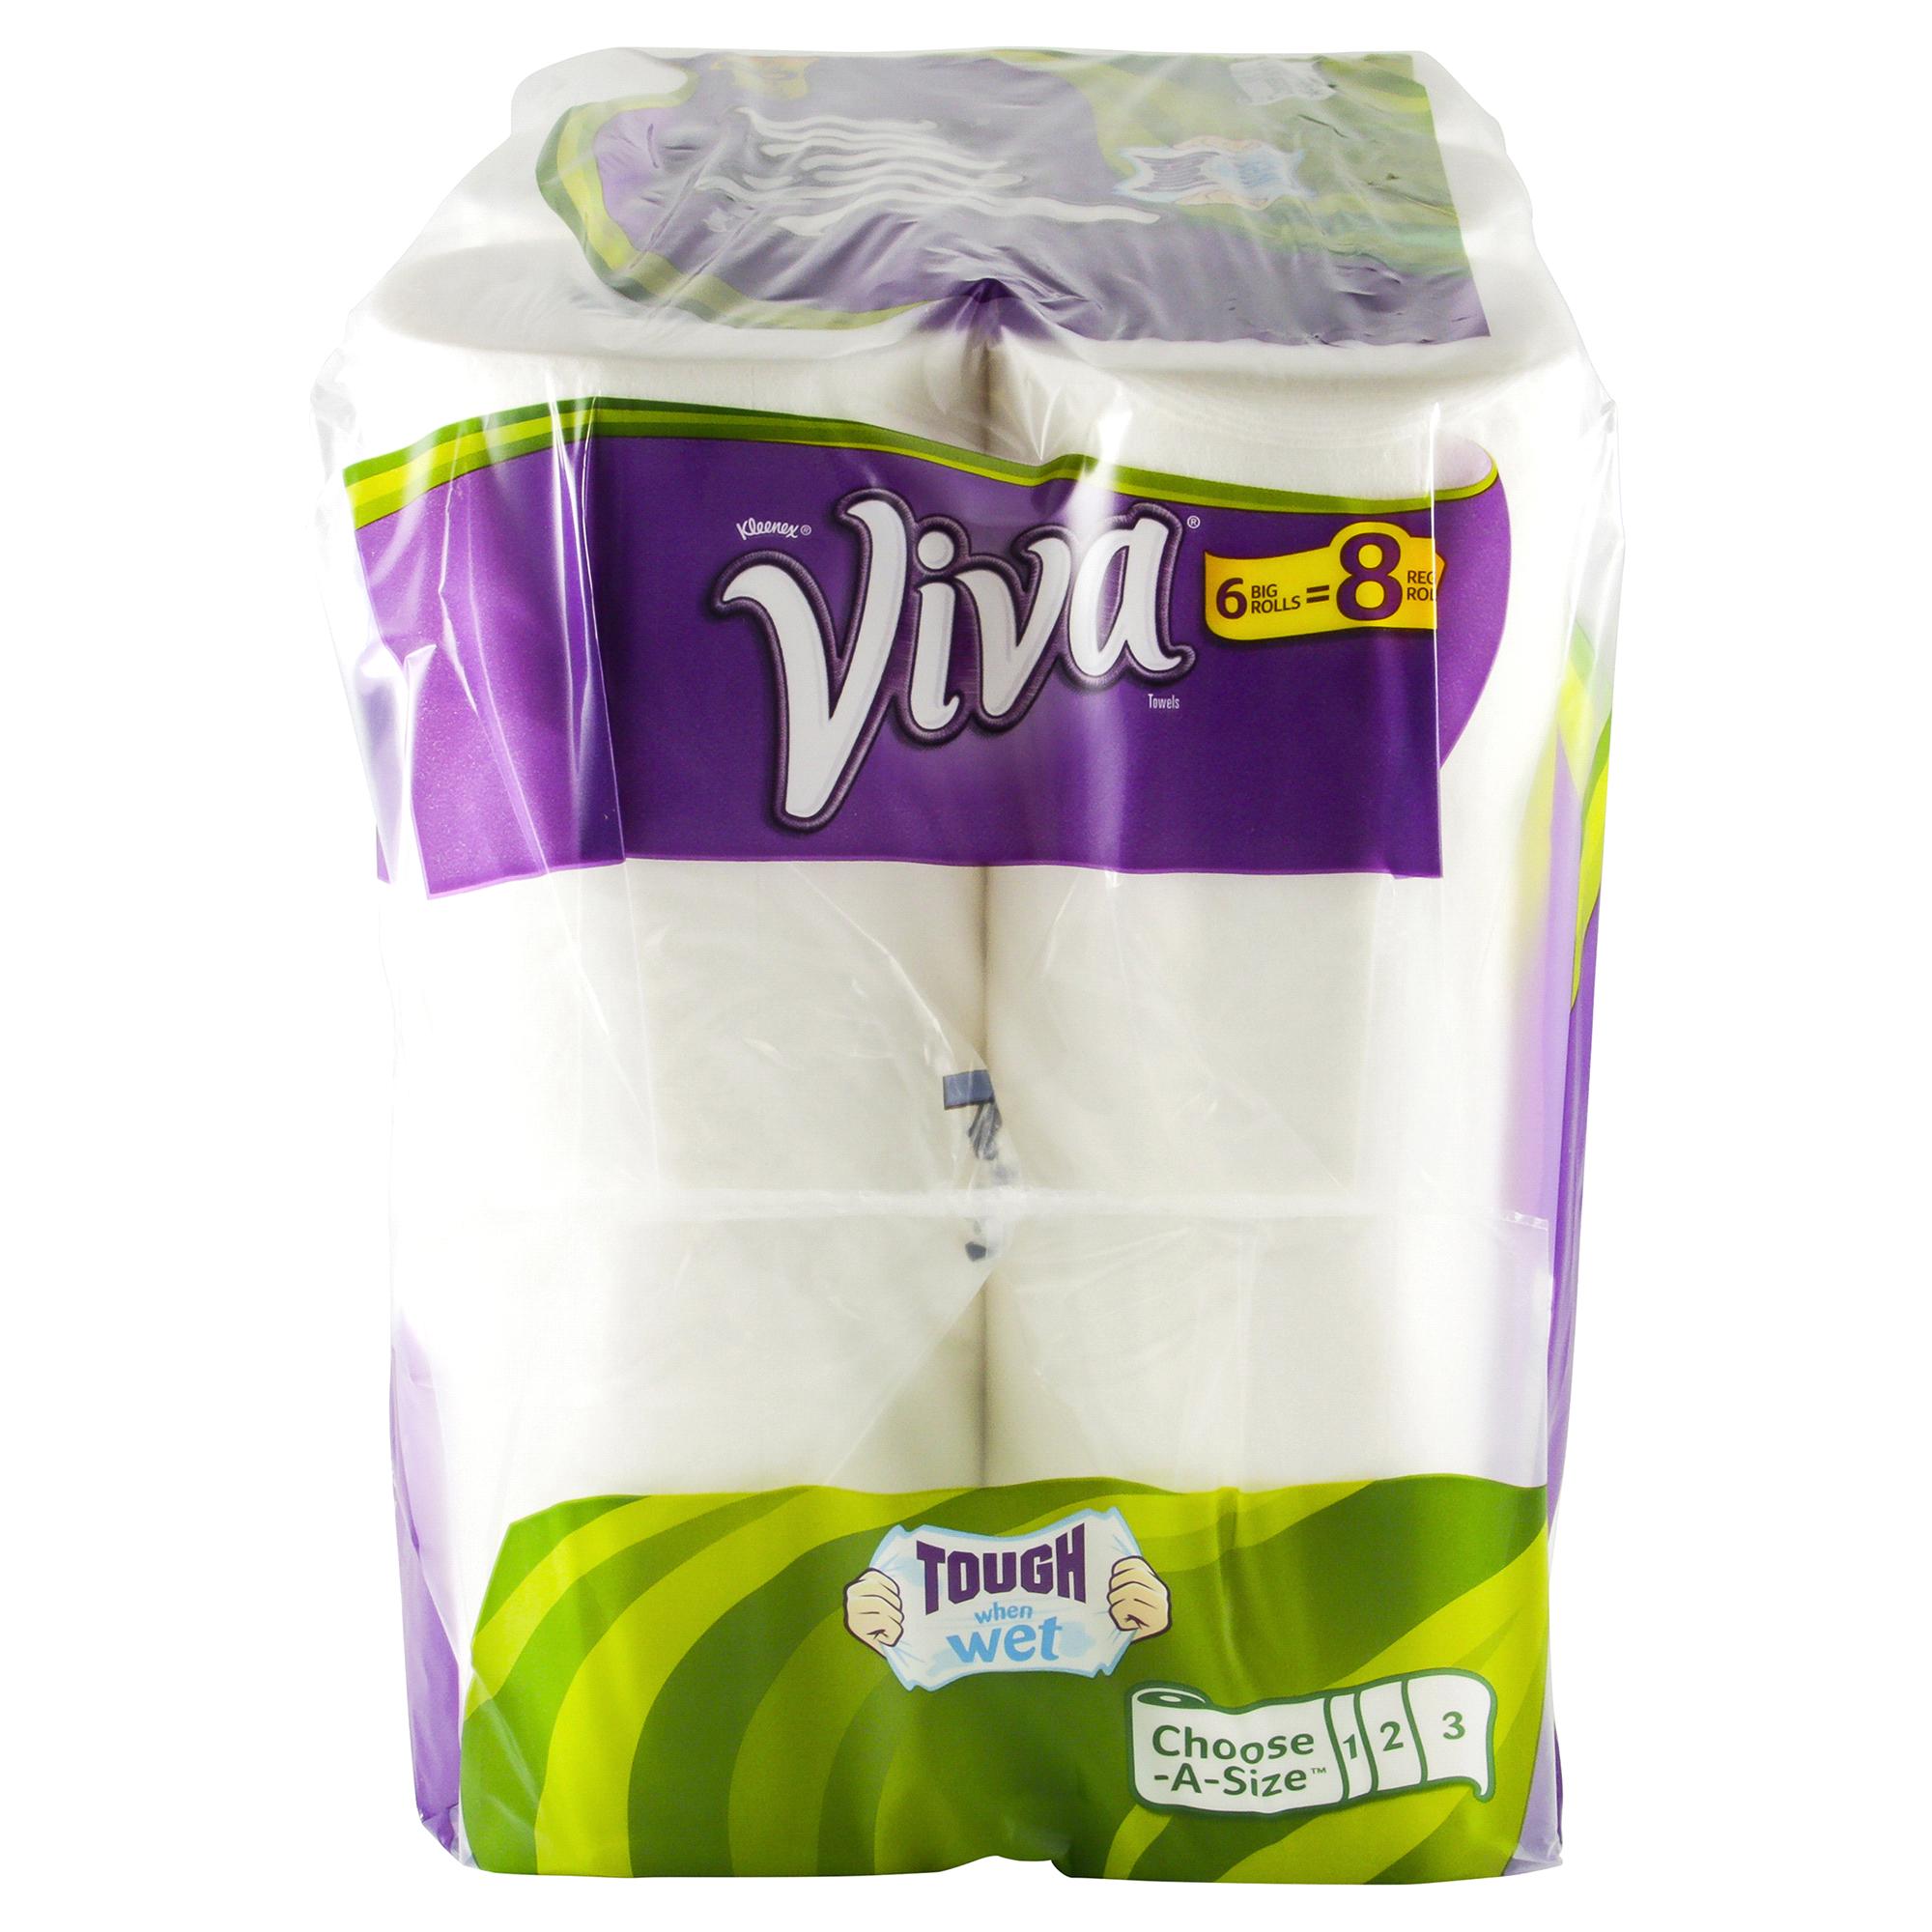 Viva Paper Towels Choose-a-Size White Big Roll 6 rolls | Meijer.com